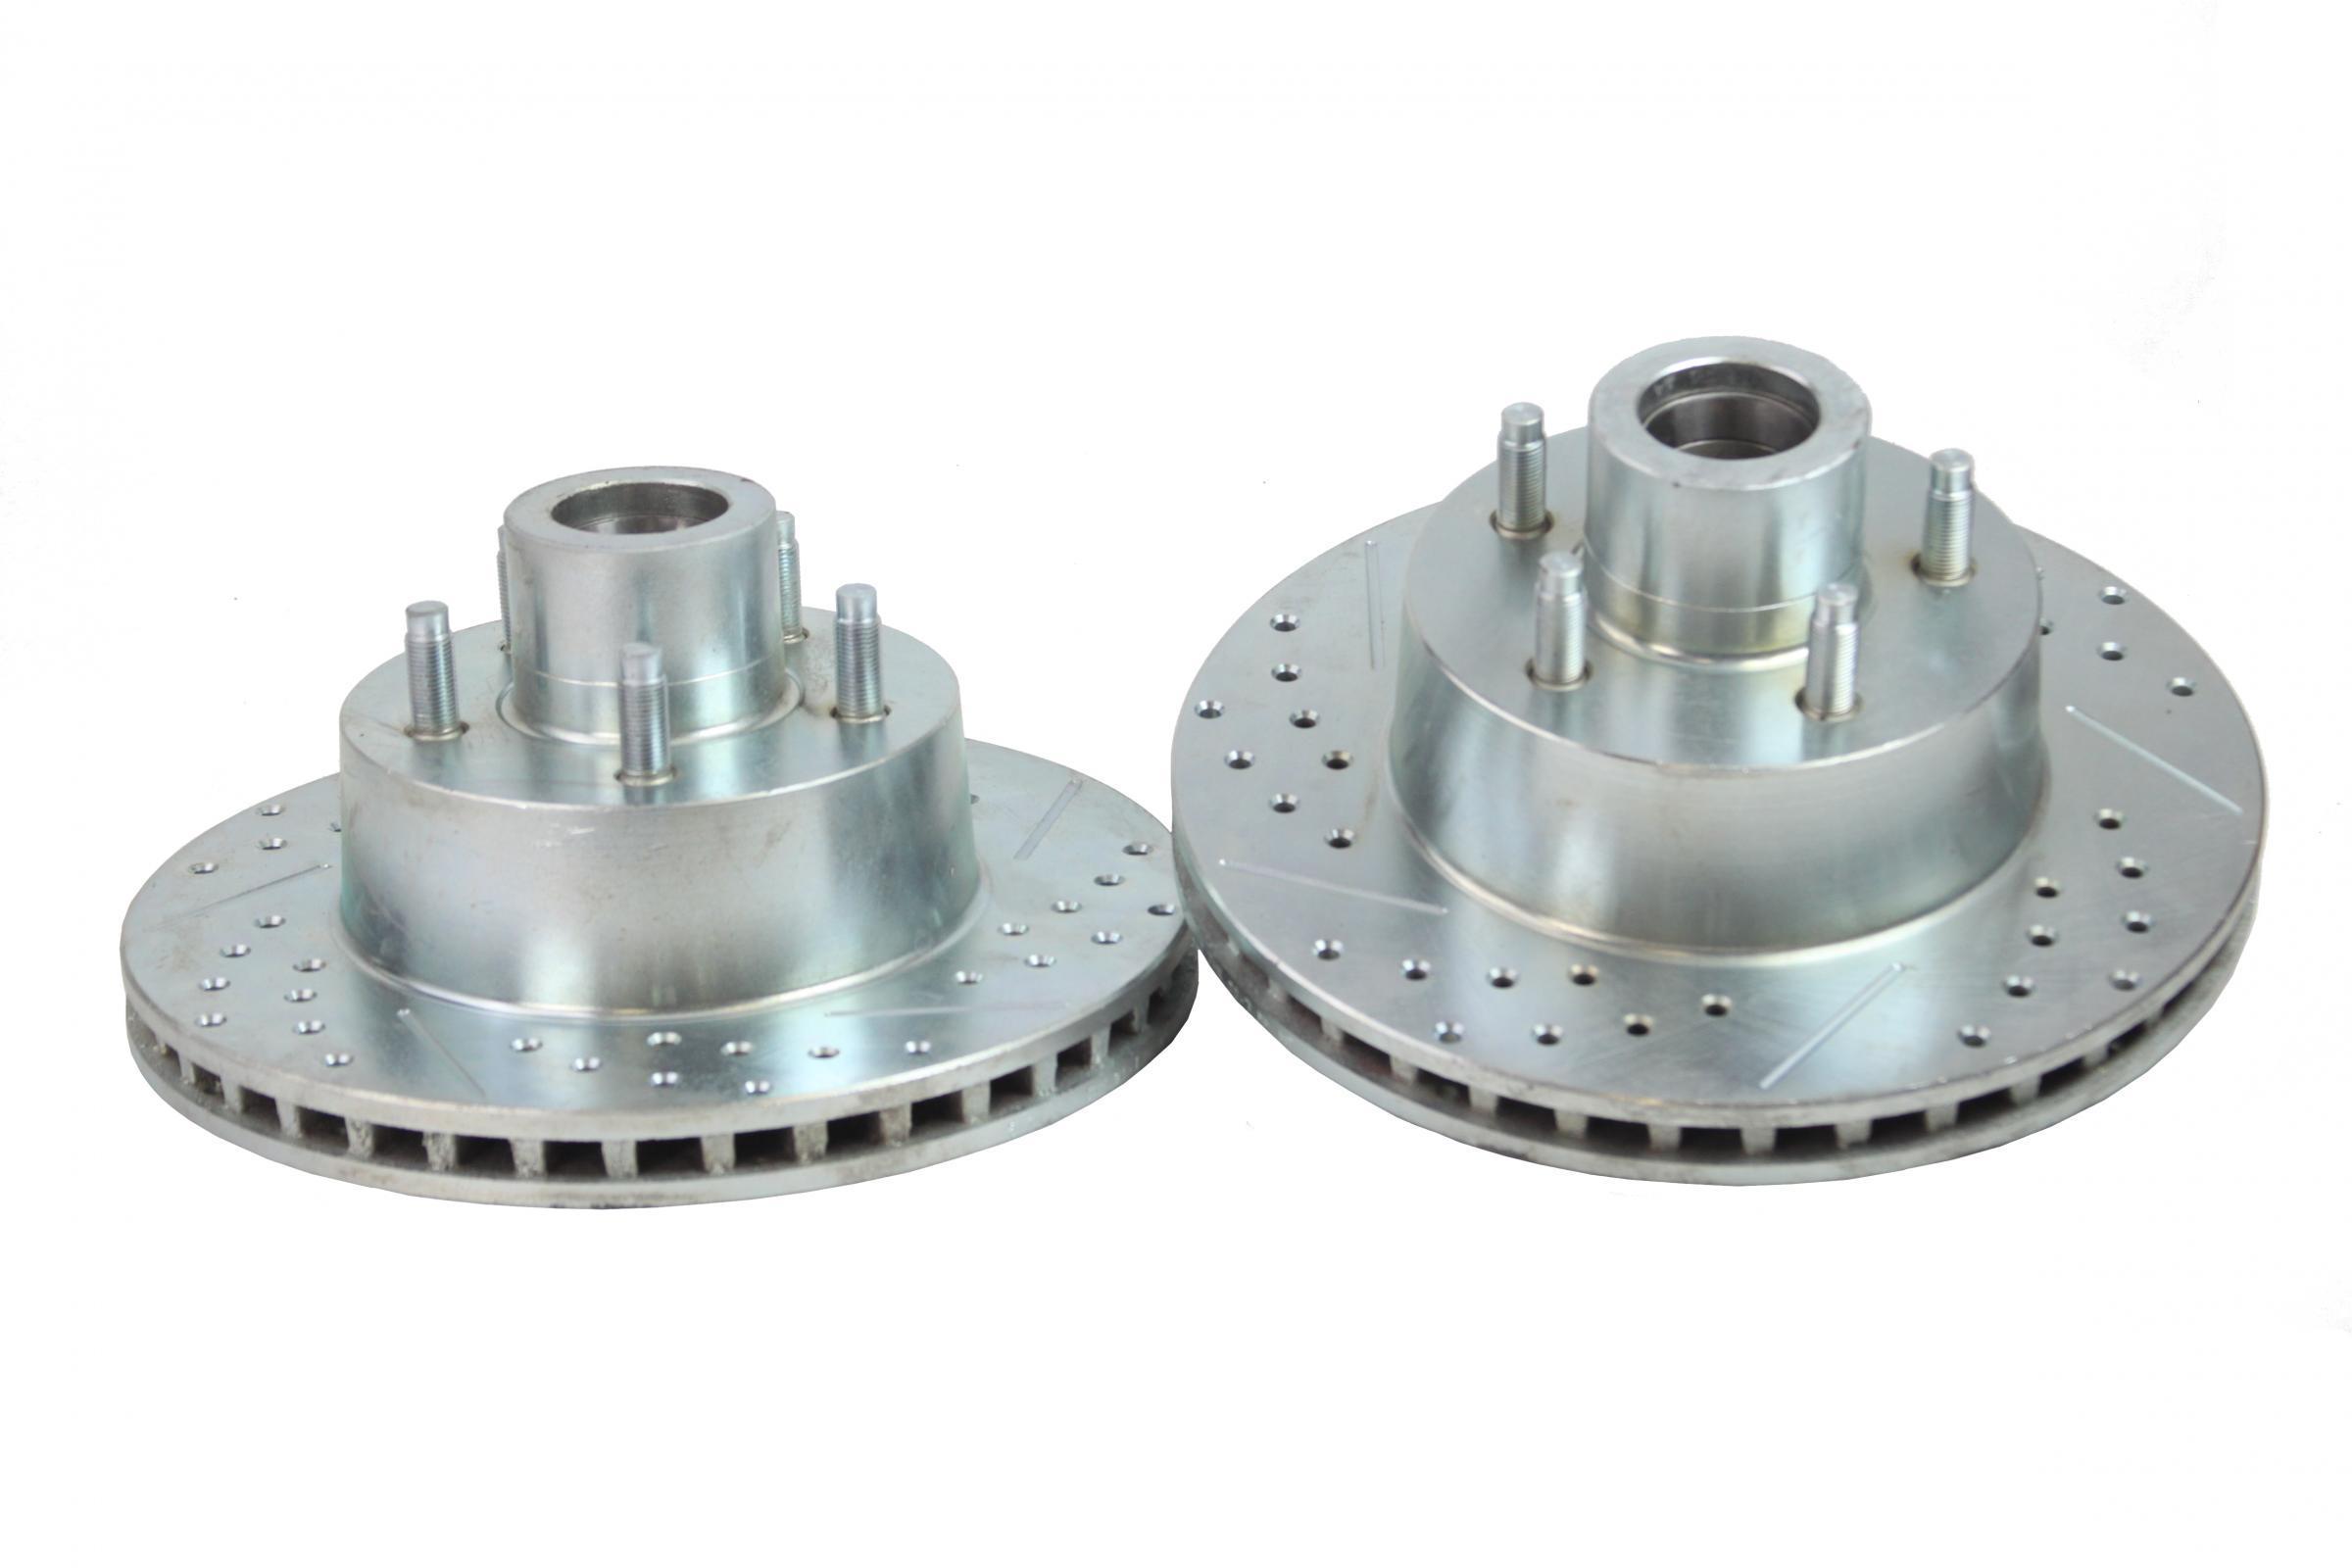 BAER Sport Rotors - Fron t Pair